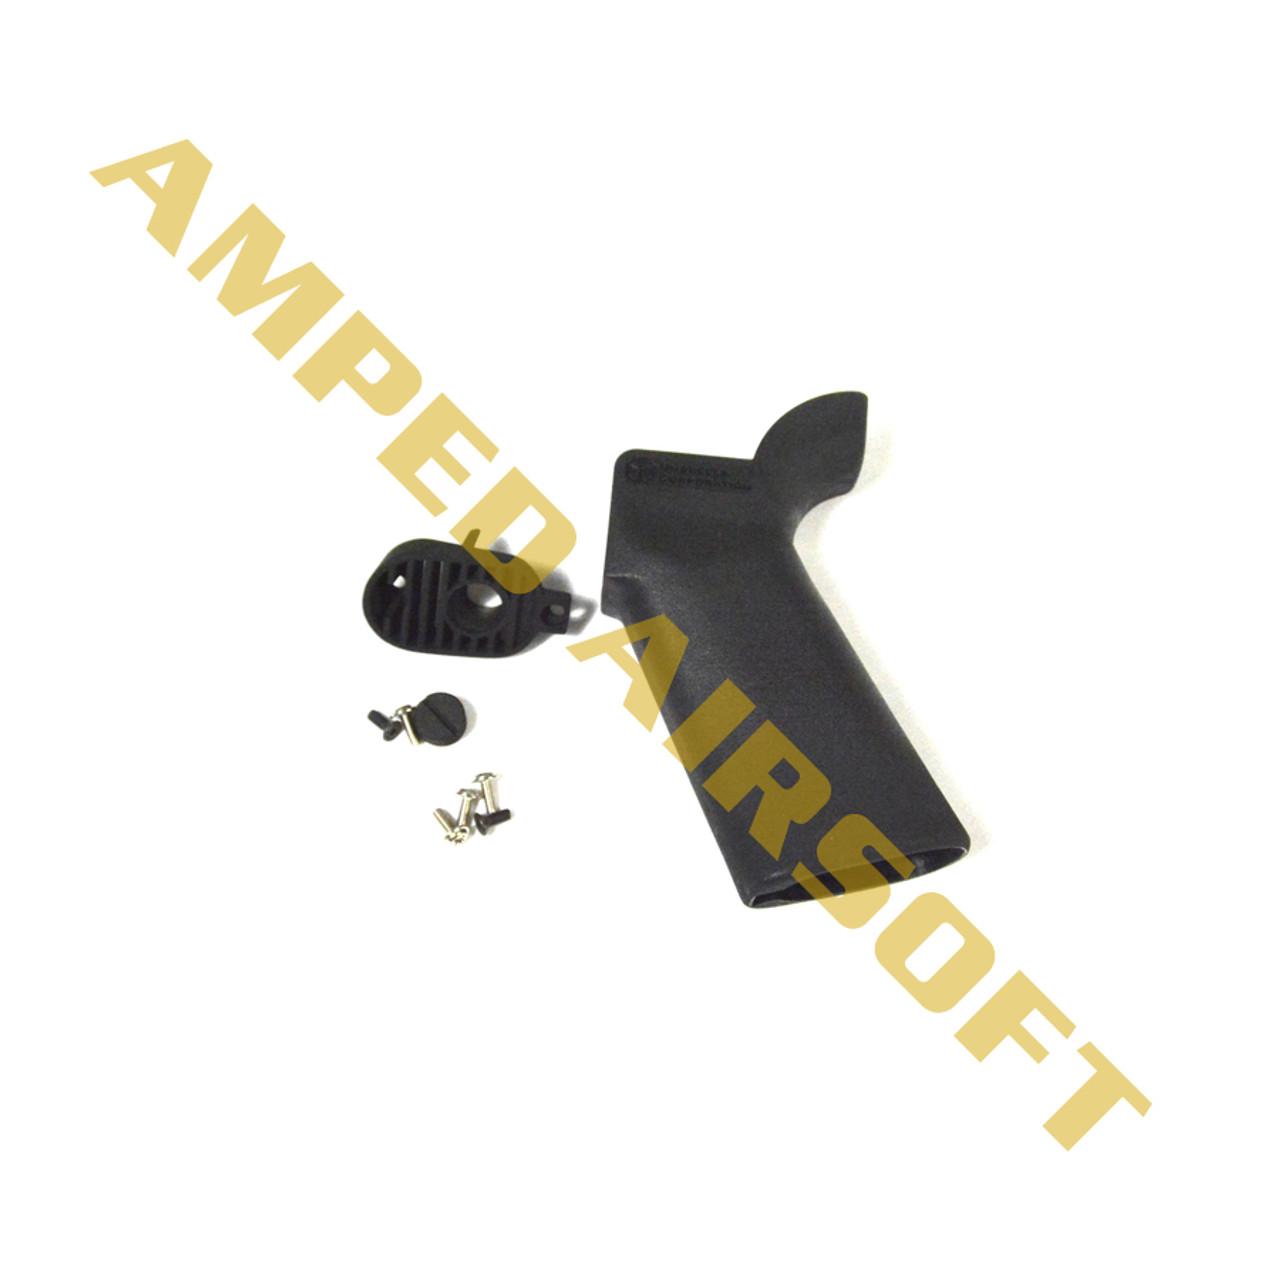 Madbull - Airsoft Umbrella Corporation Lic Pistol/Motor Grip 23 for Airsoft M4/M16 (Black)